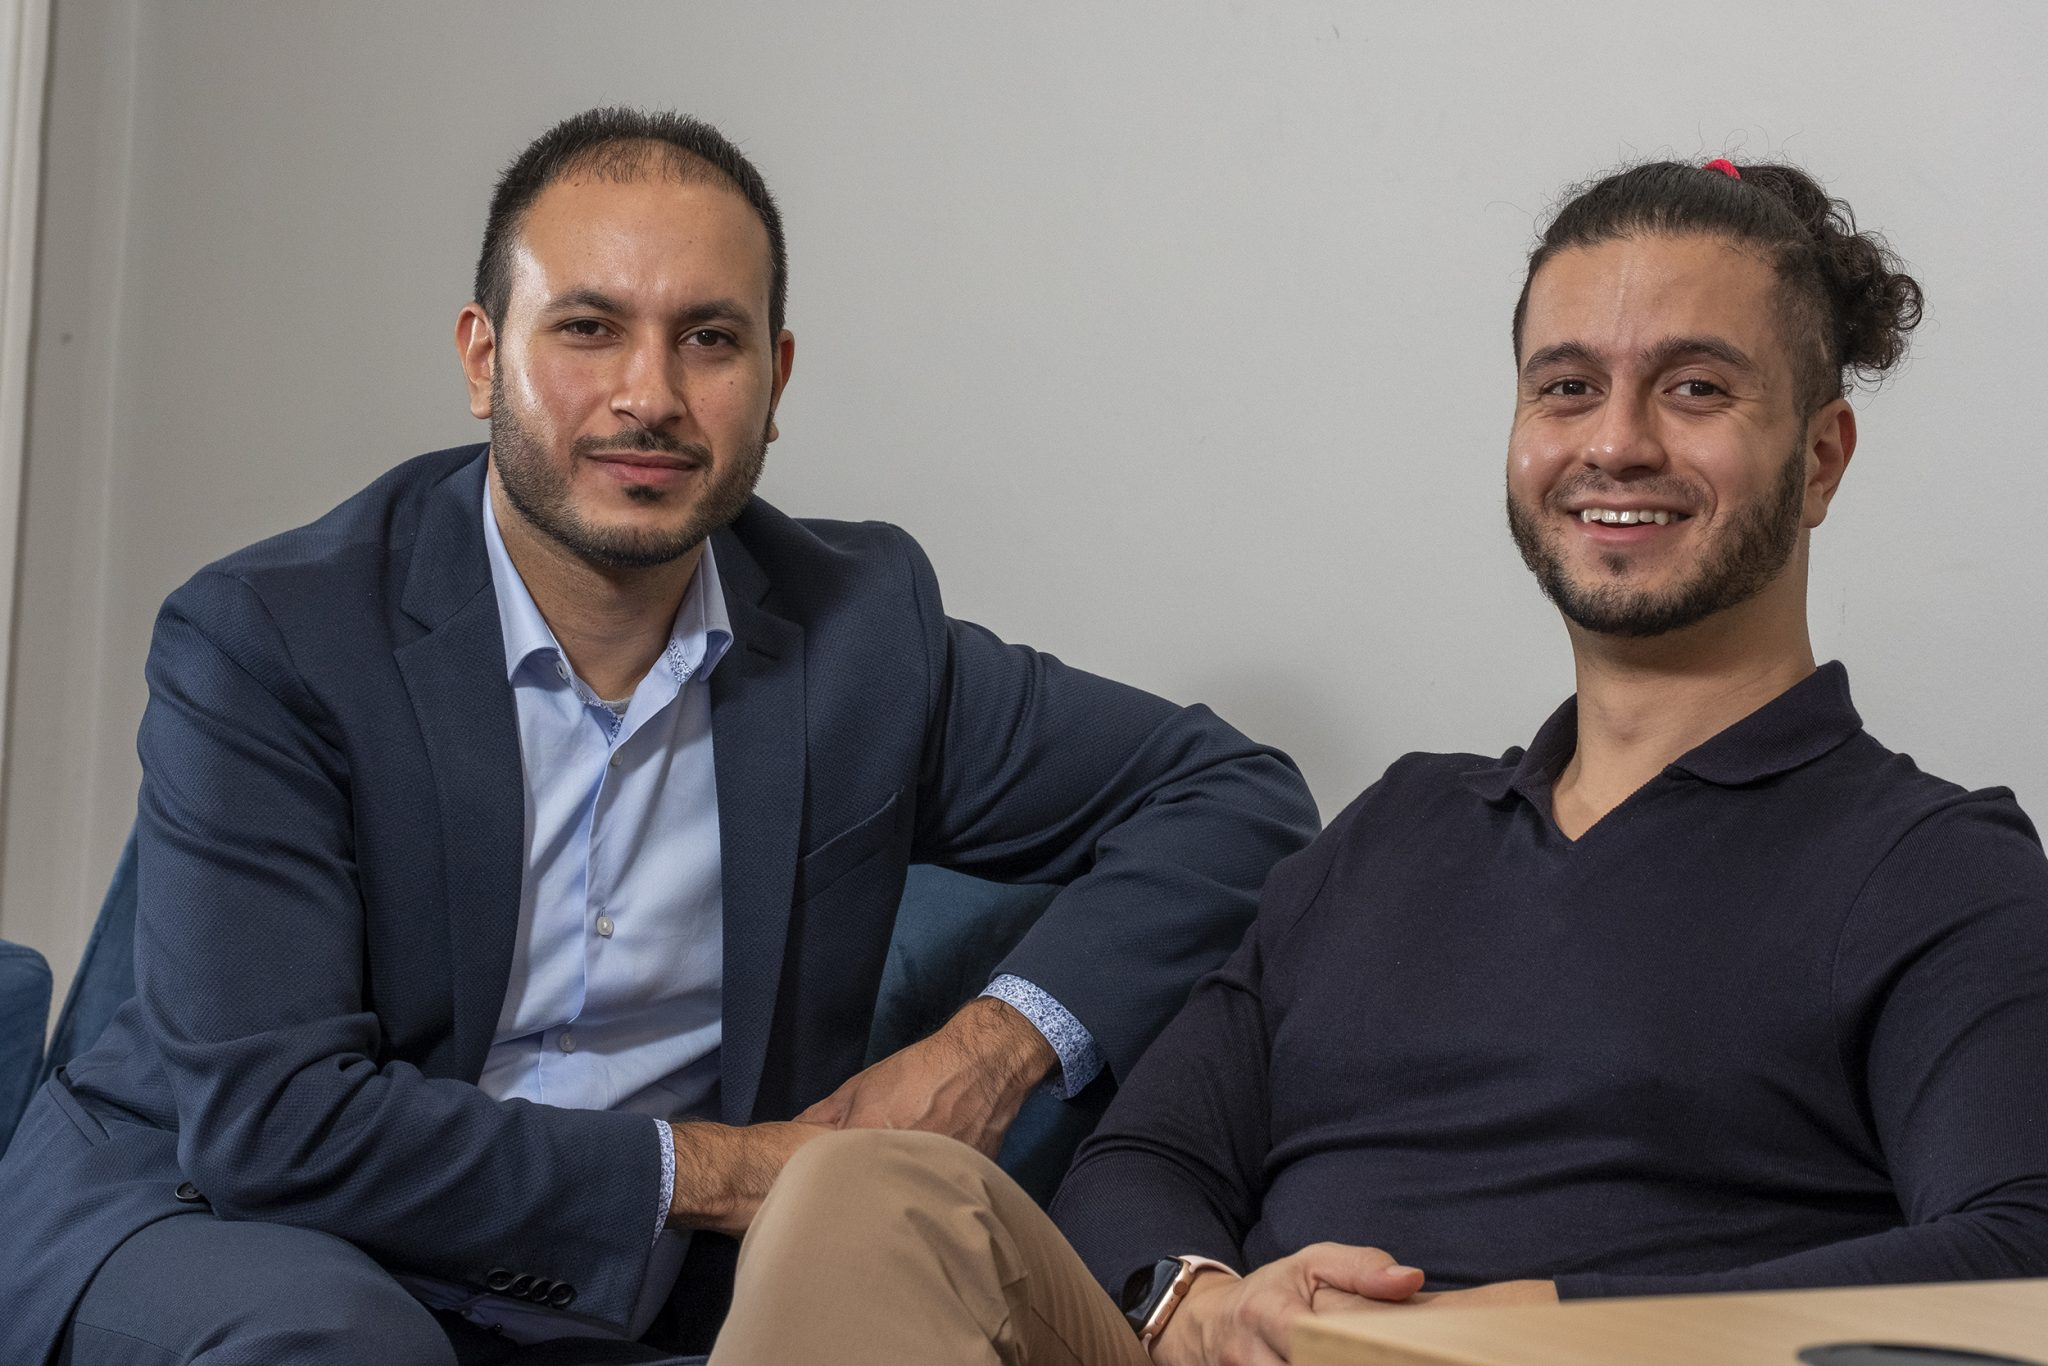 Algbra's co-founders